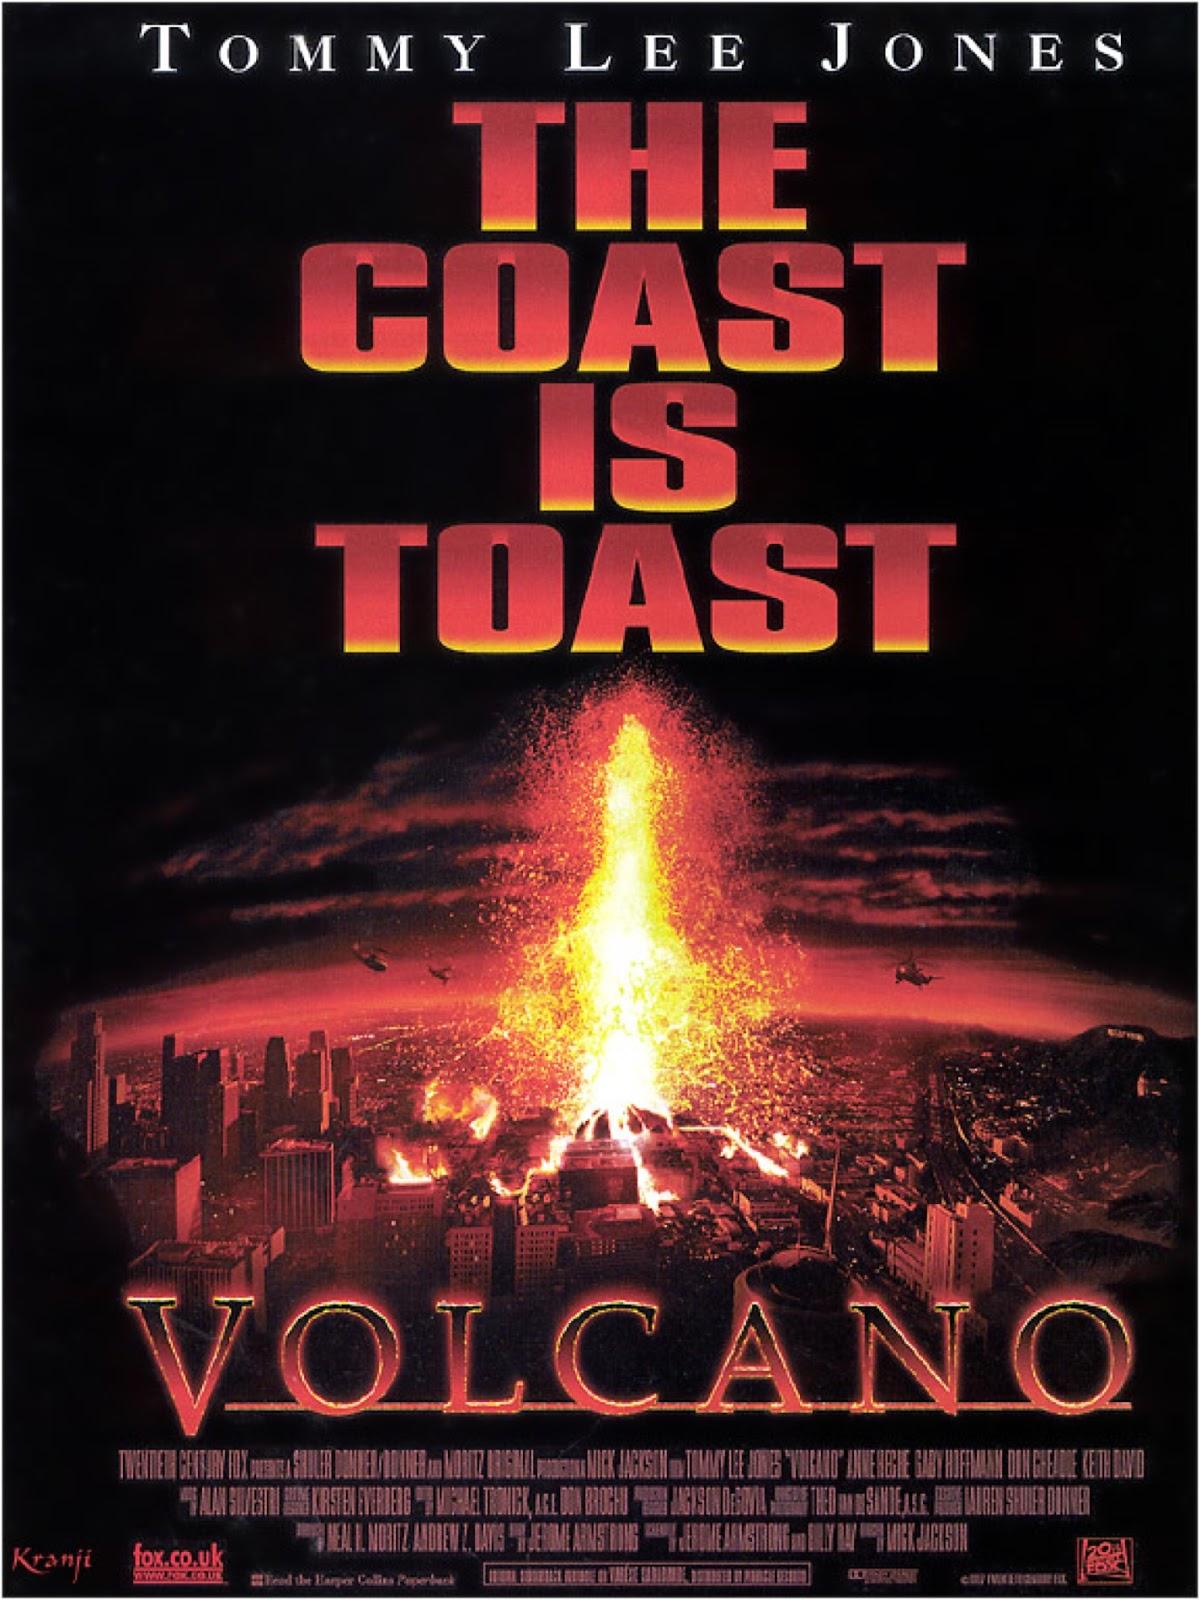 volcanodsd12s1d.jpg